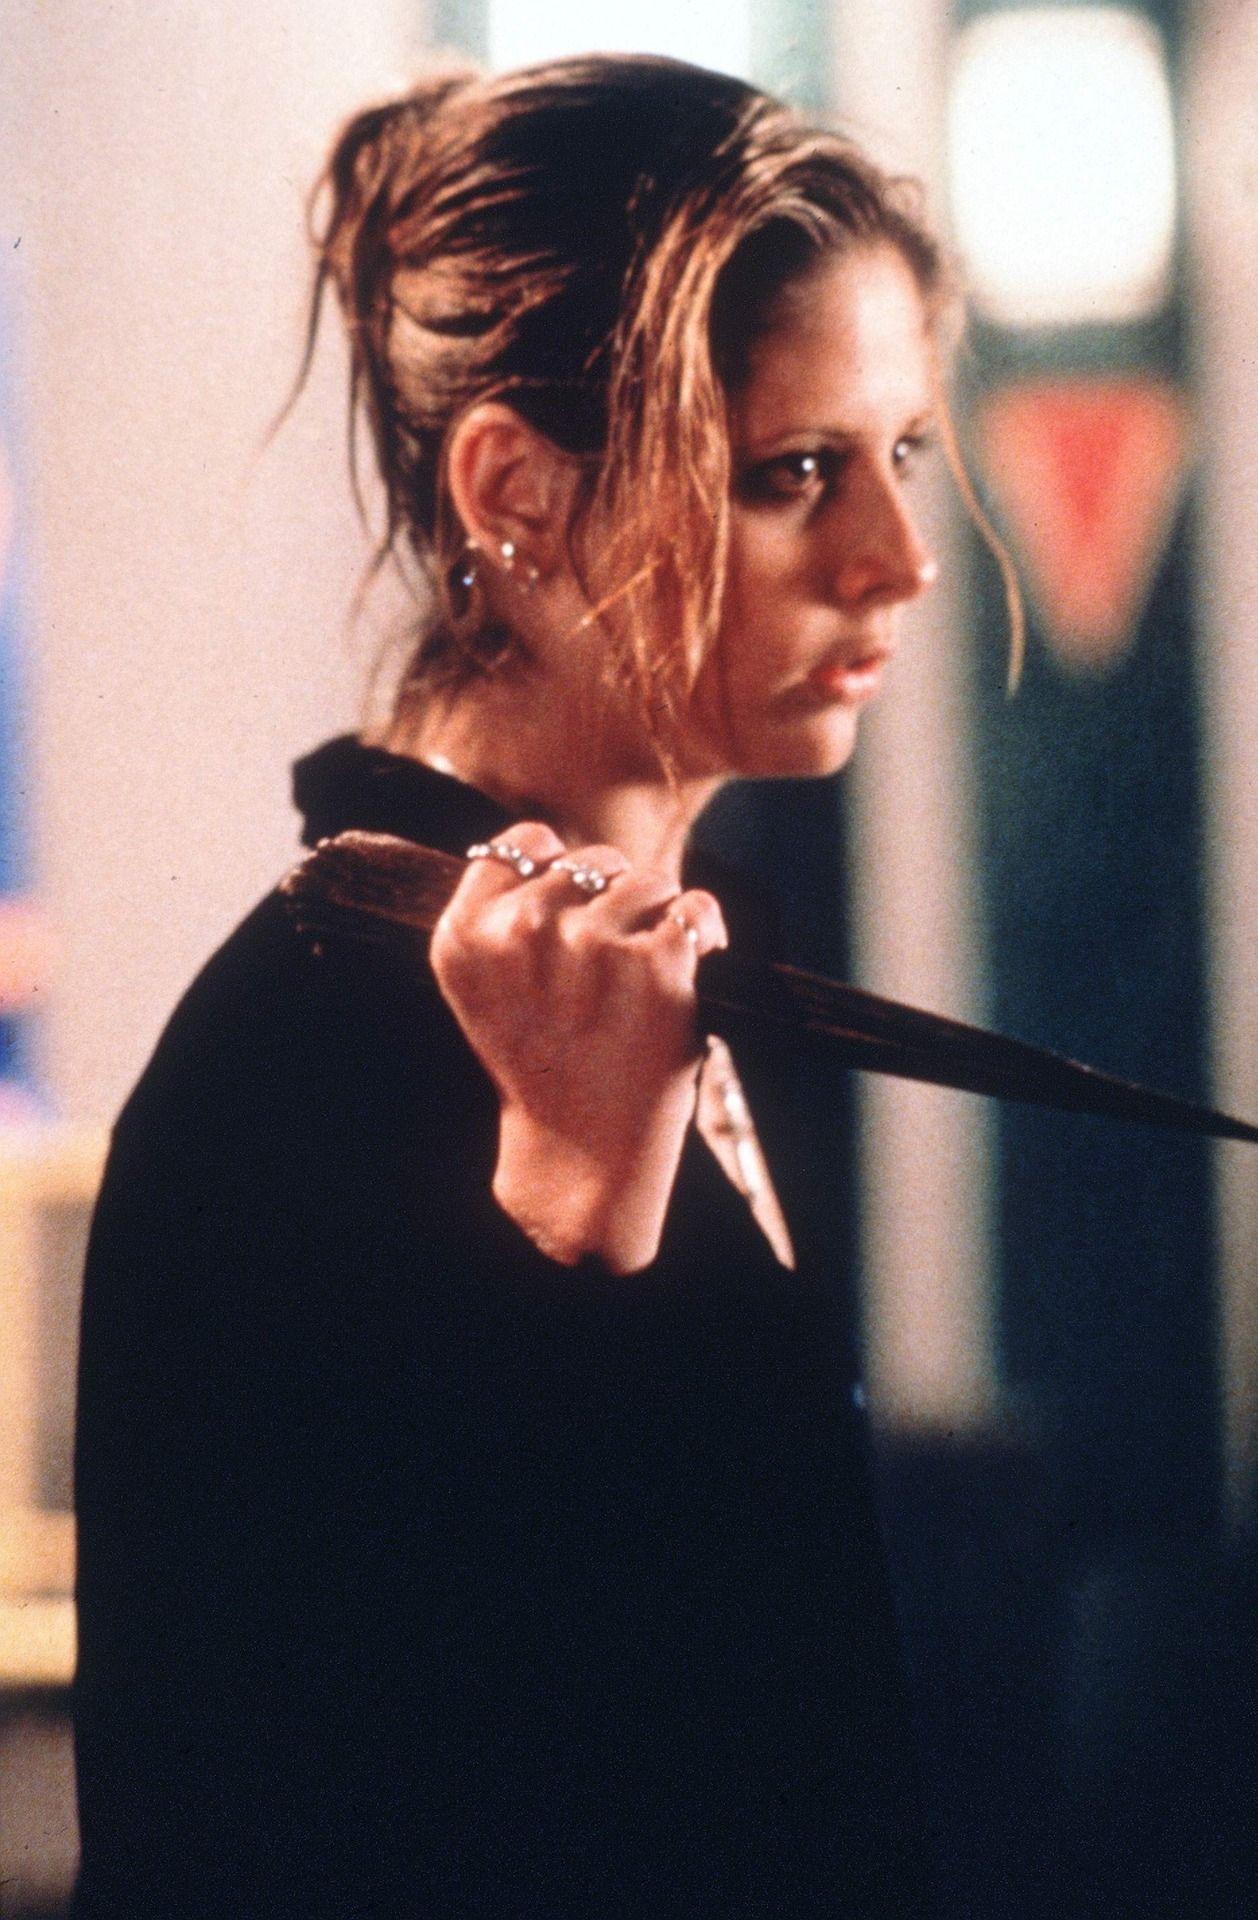 Buffy - the vampire slayer